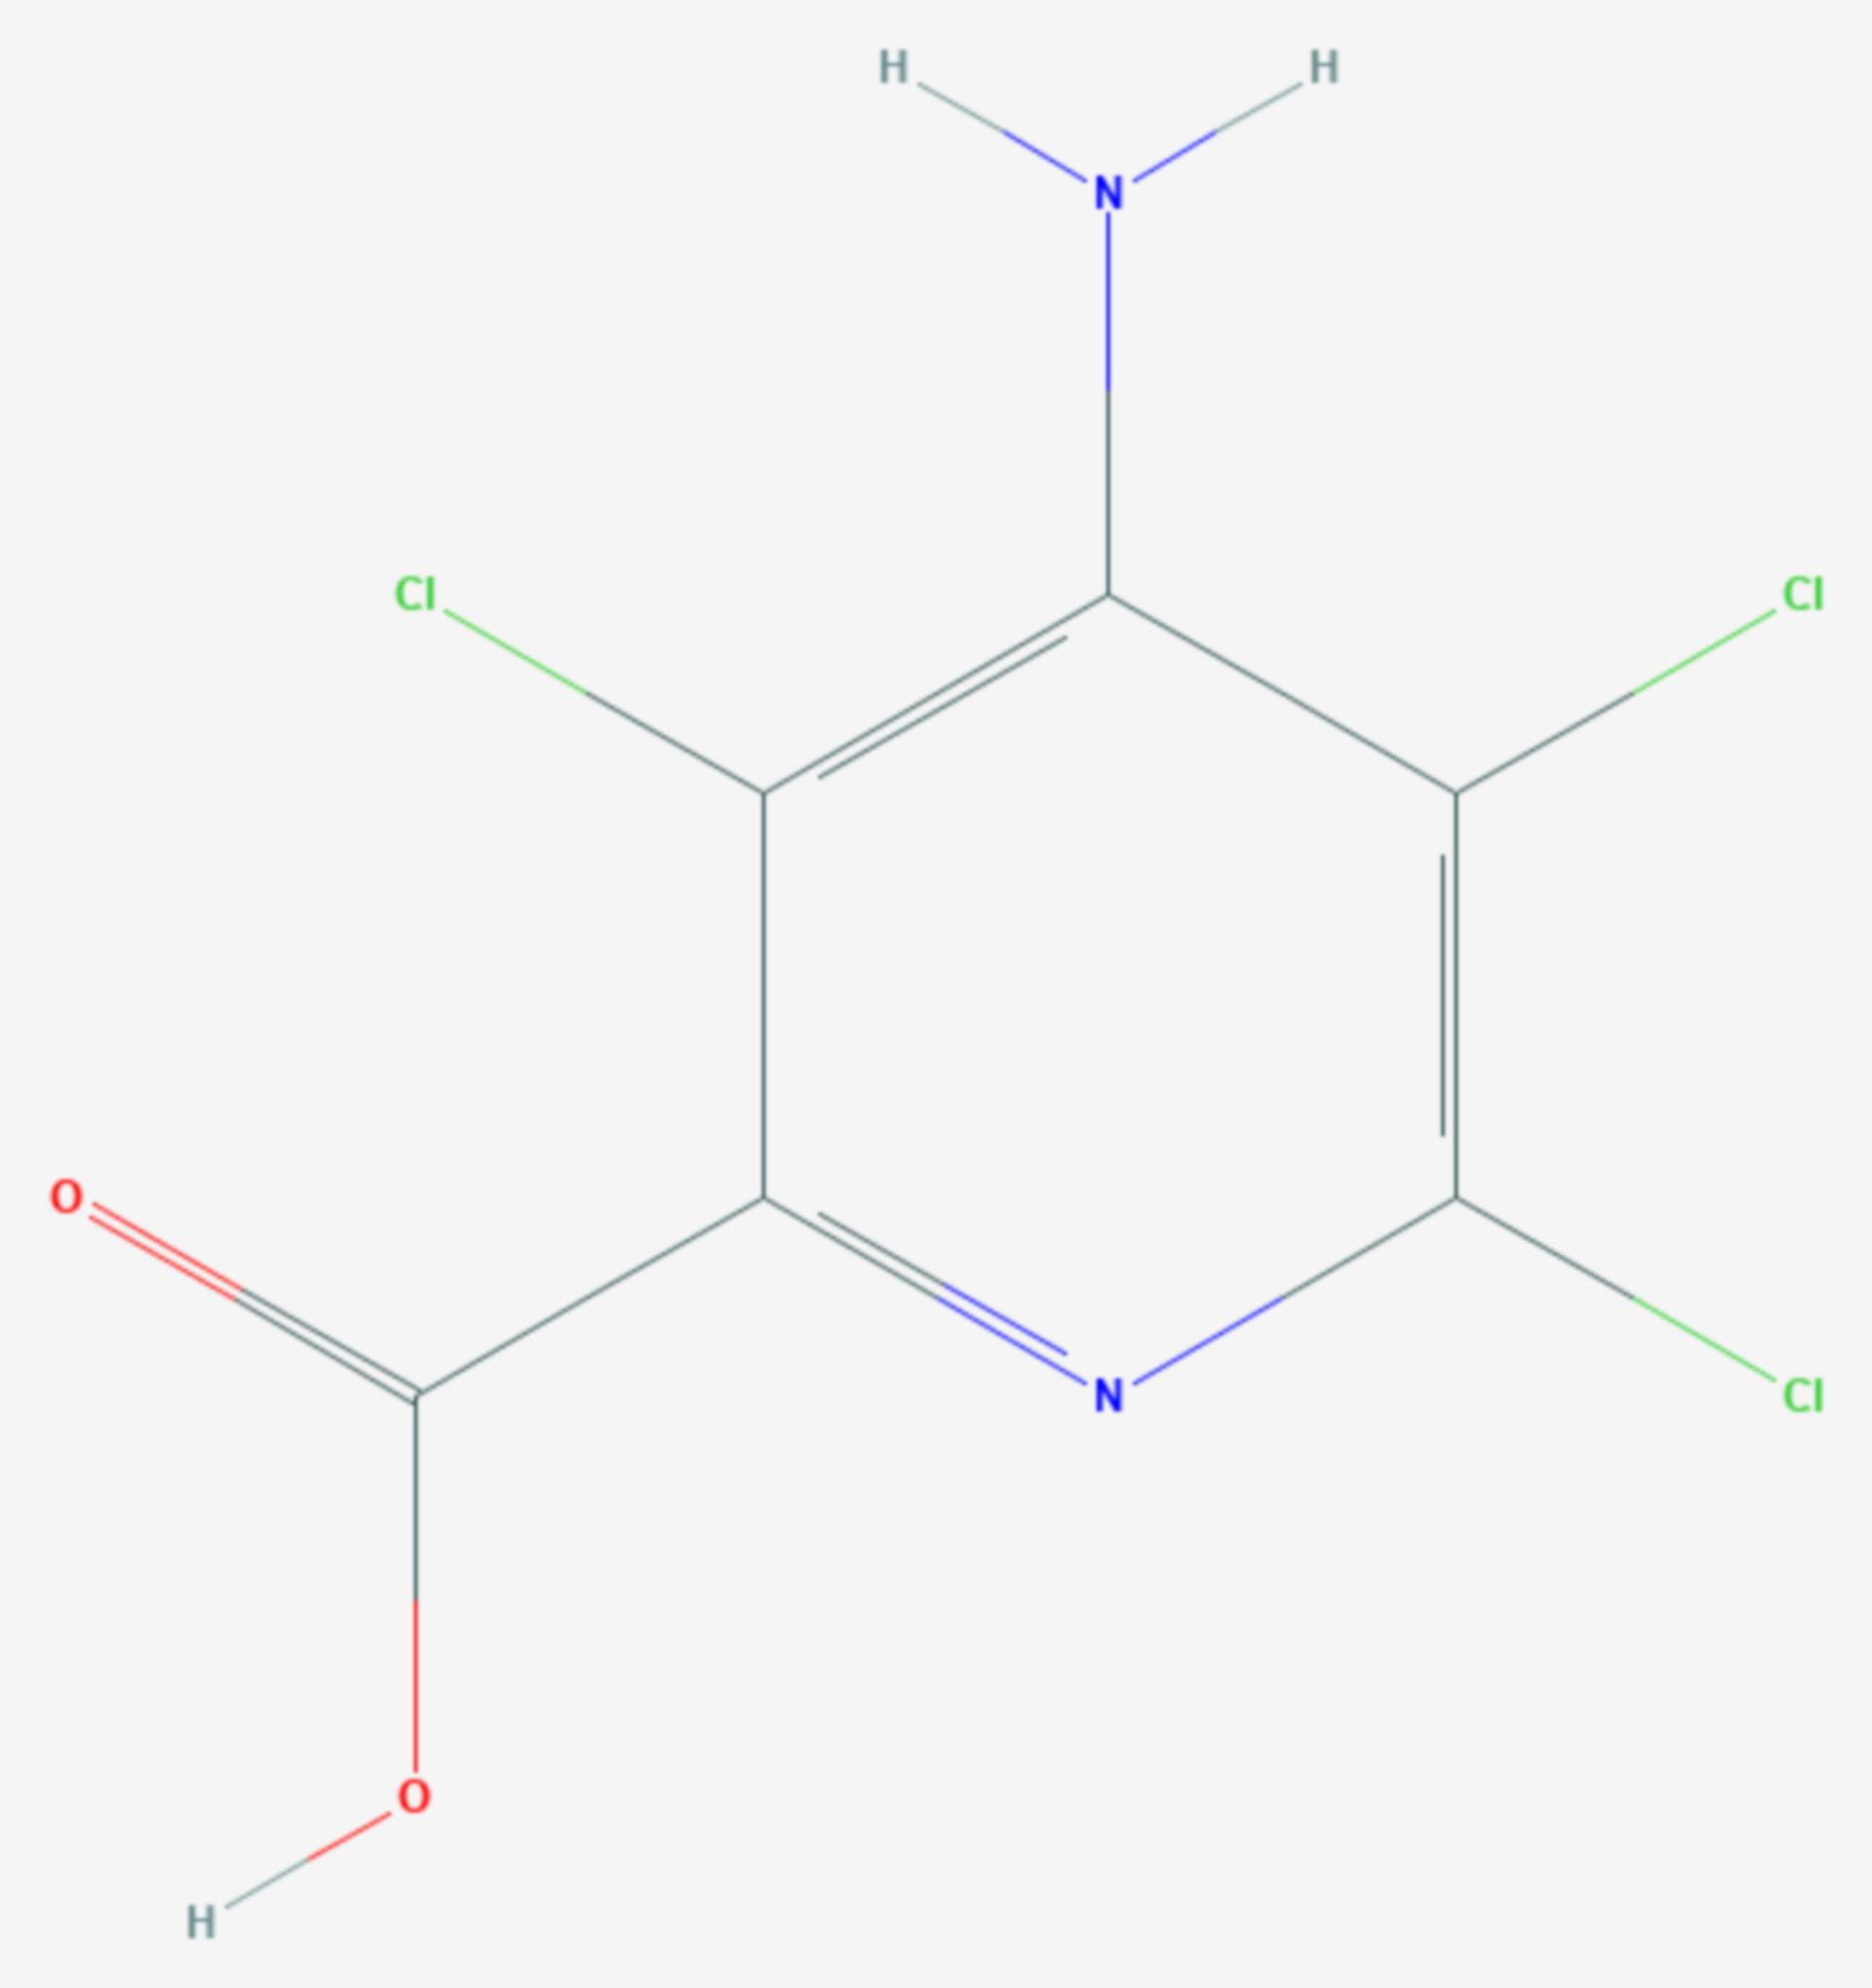 Picloram (Strukturformel)